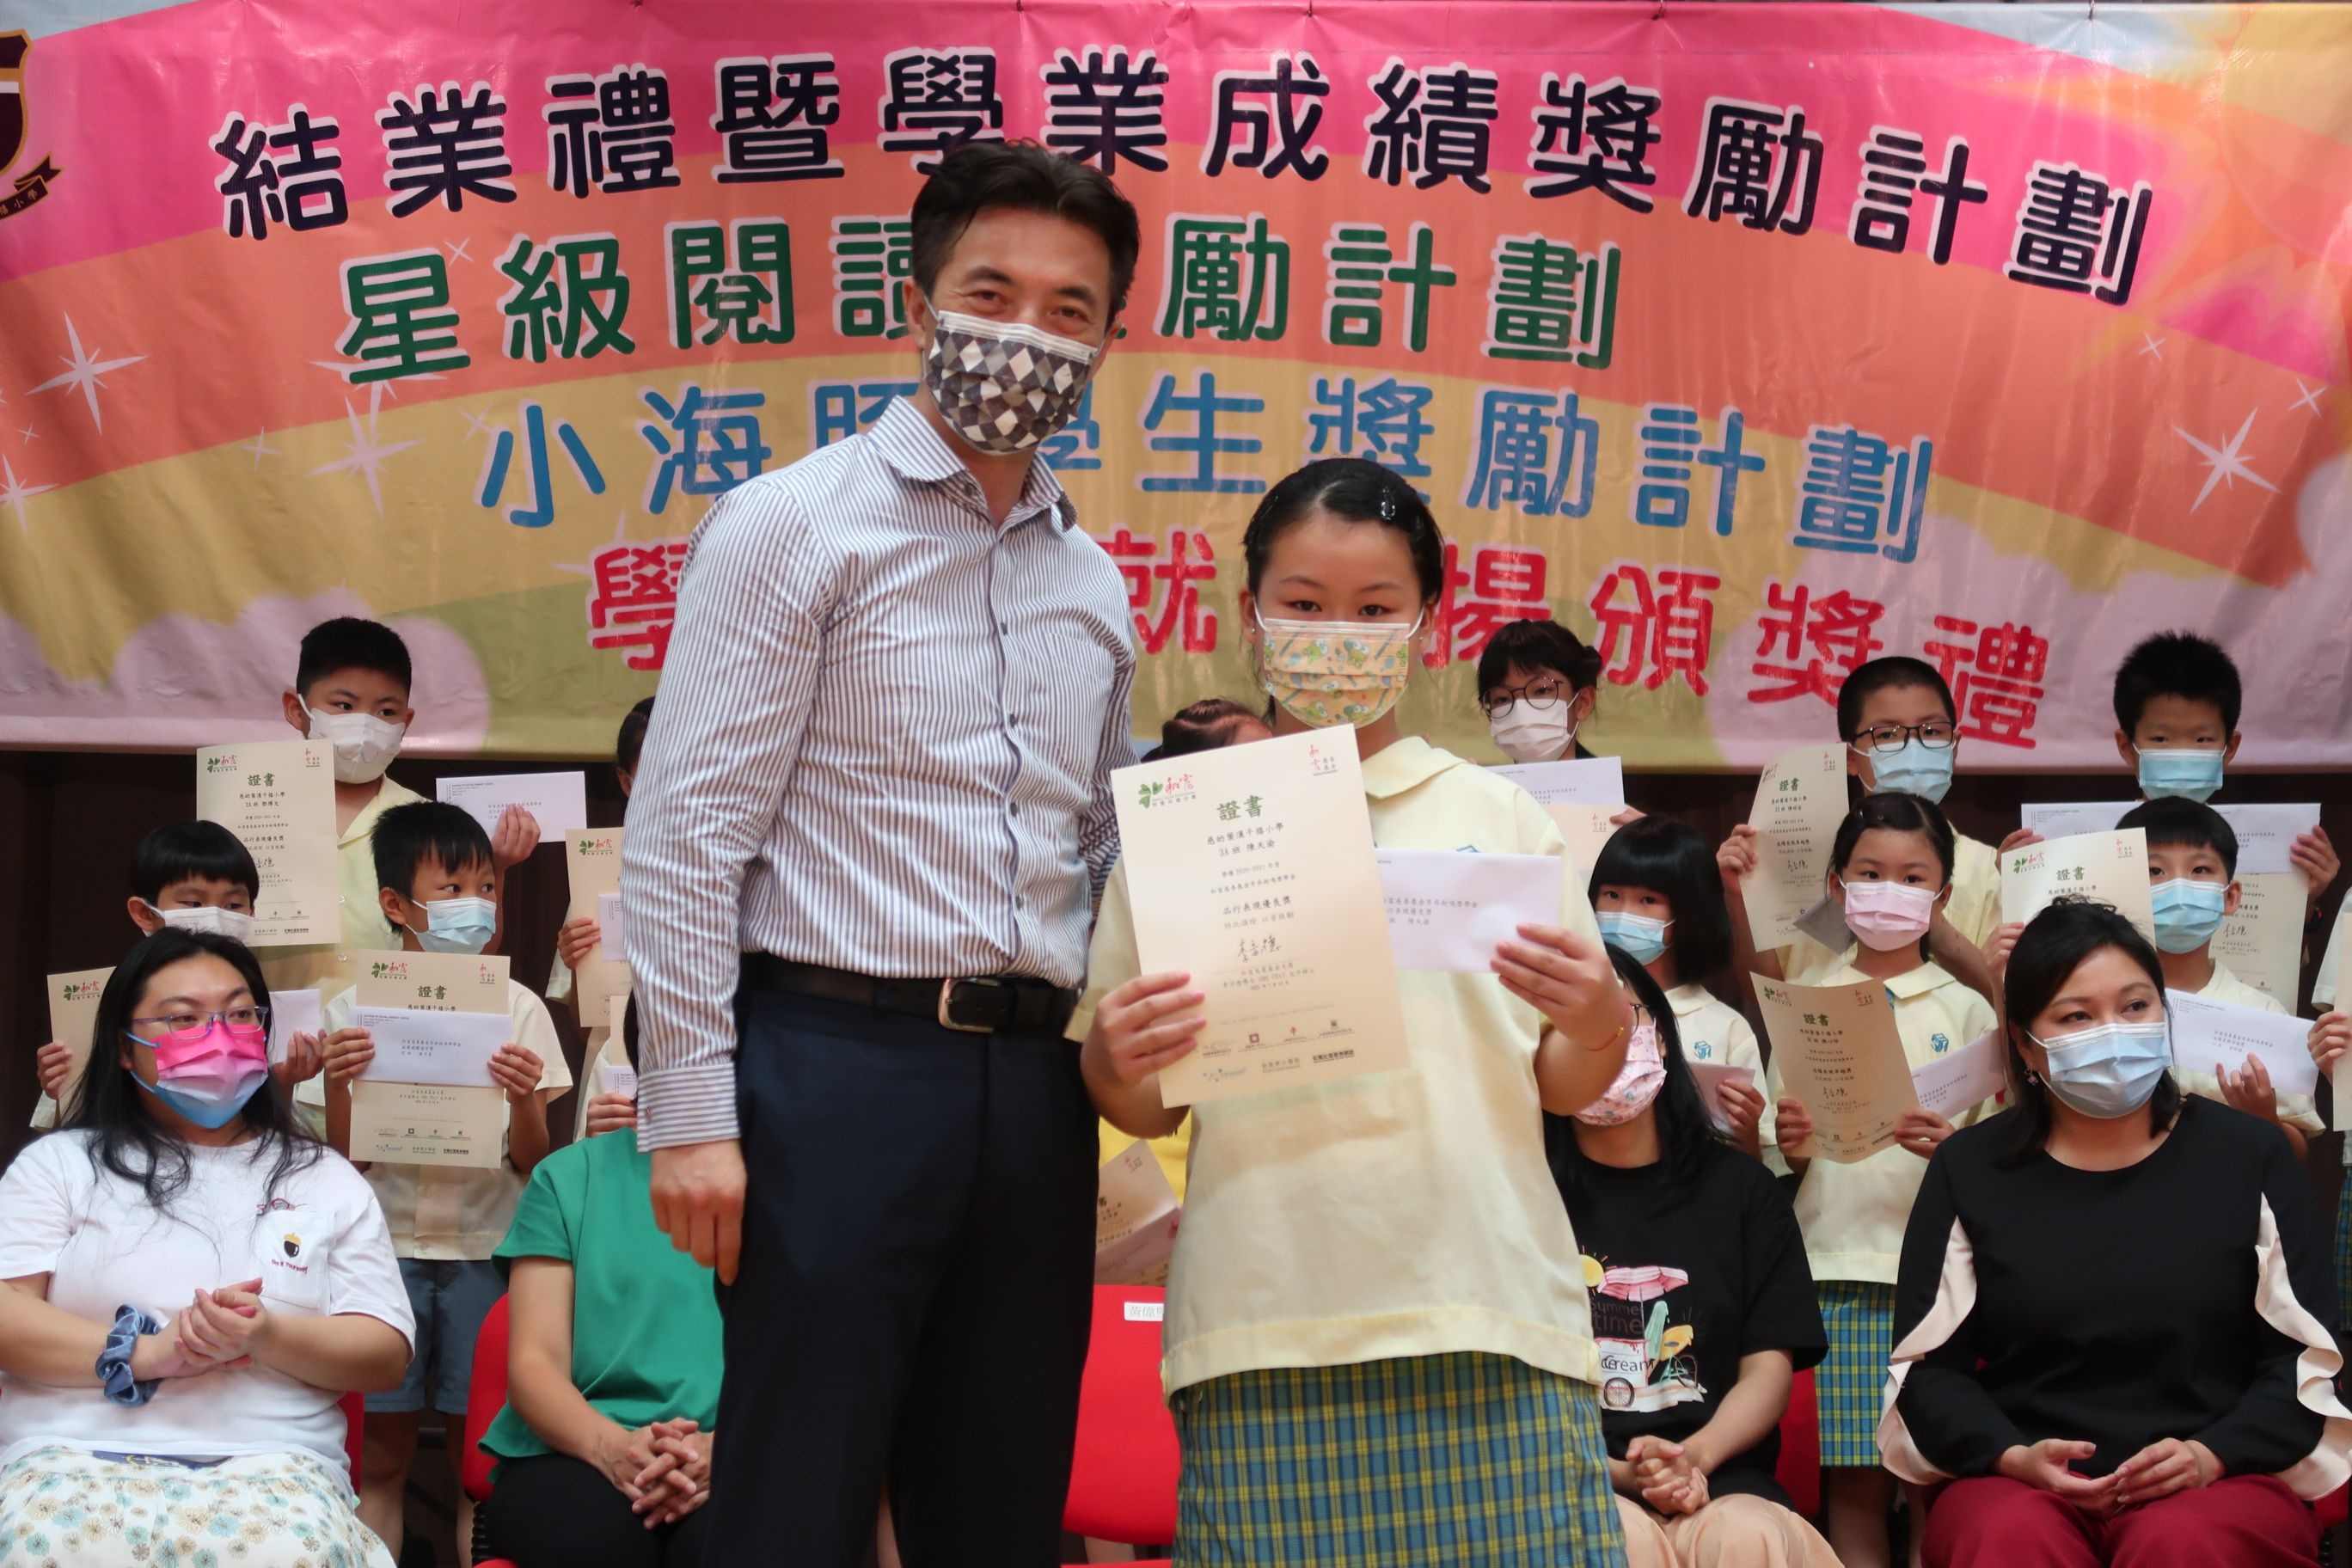 https://syh.edu.hk/sites/default/files/img_5960_1.jpg